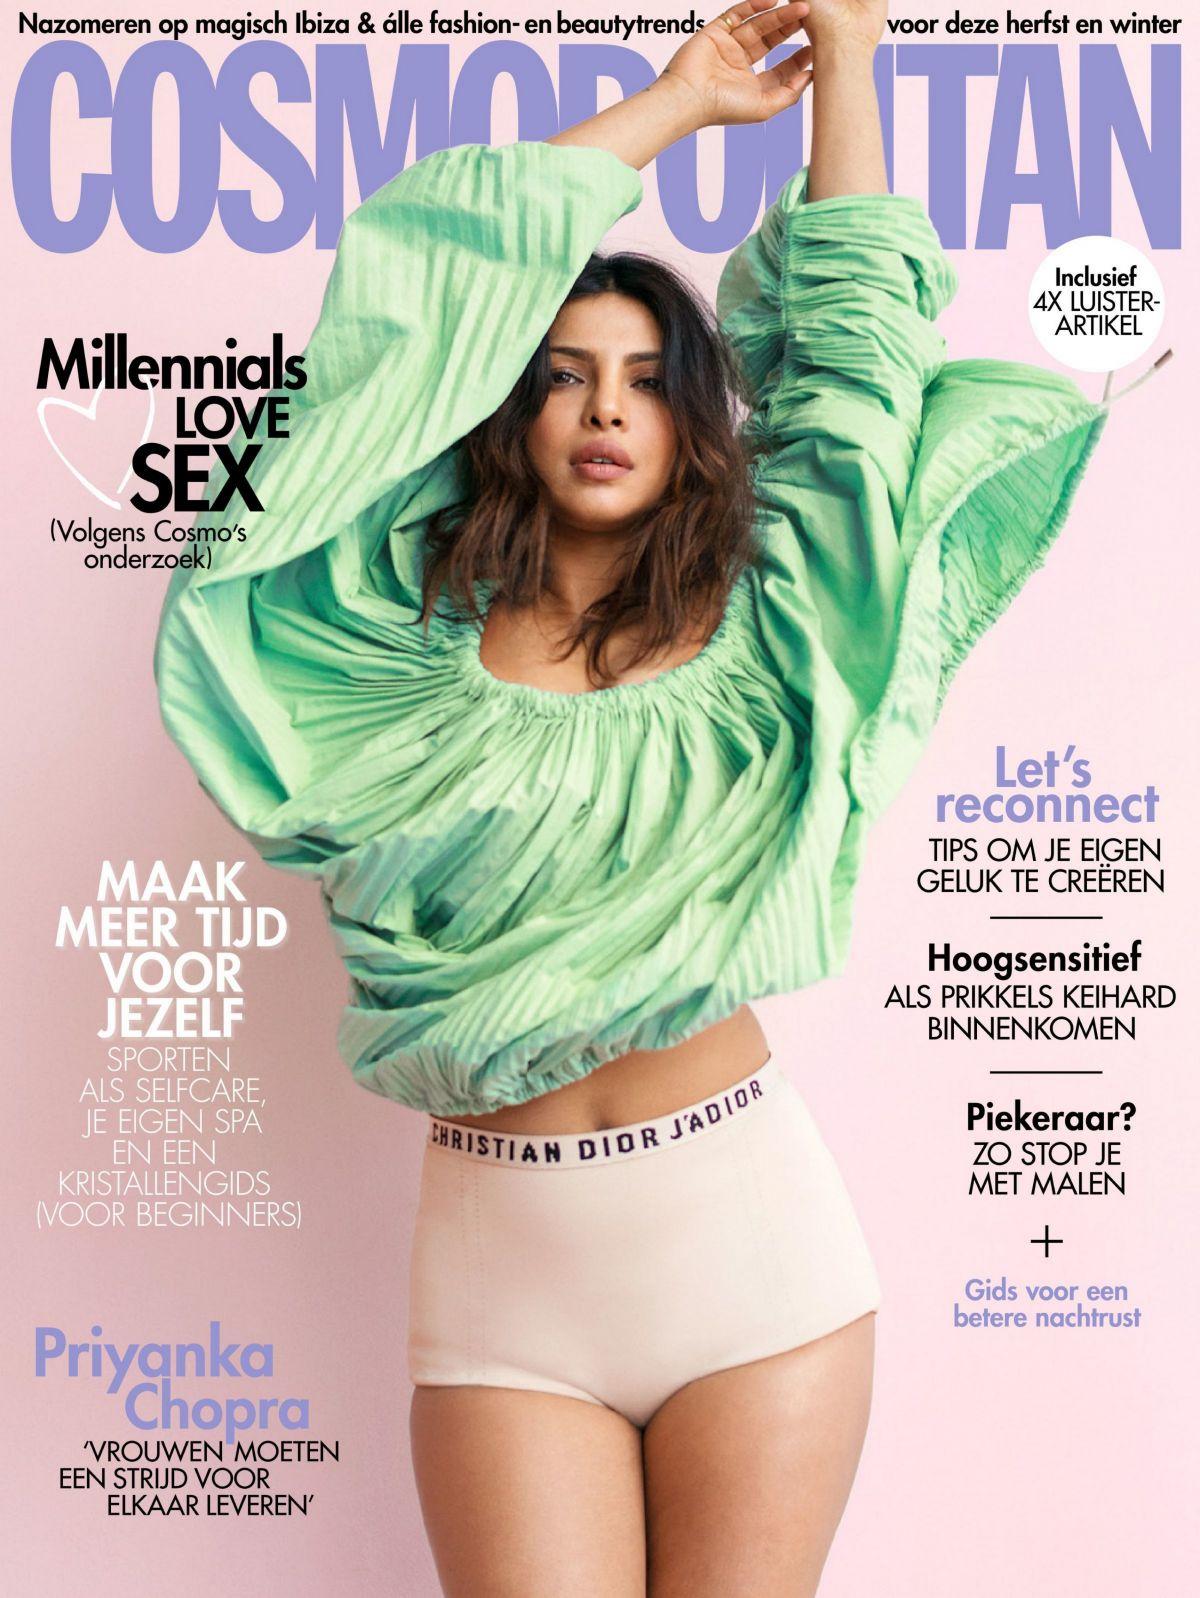 https://www.hawtcelebs.com/wp-content/uploads/2019/08/priyanka-chopra-in-cosmopolitan-magazine-netherlands-september-2019-2.jpg